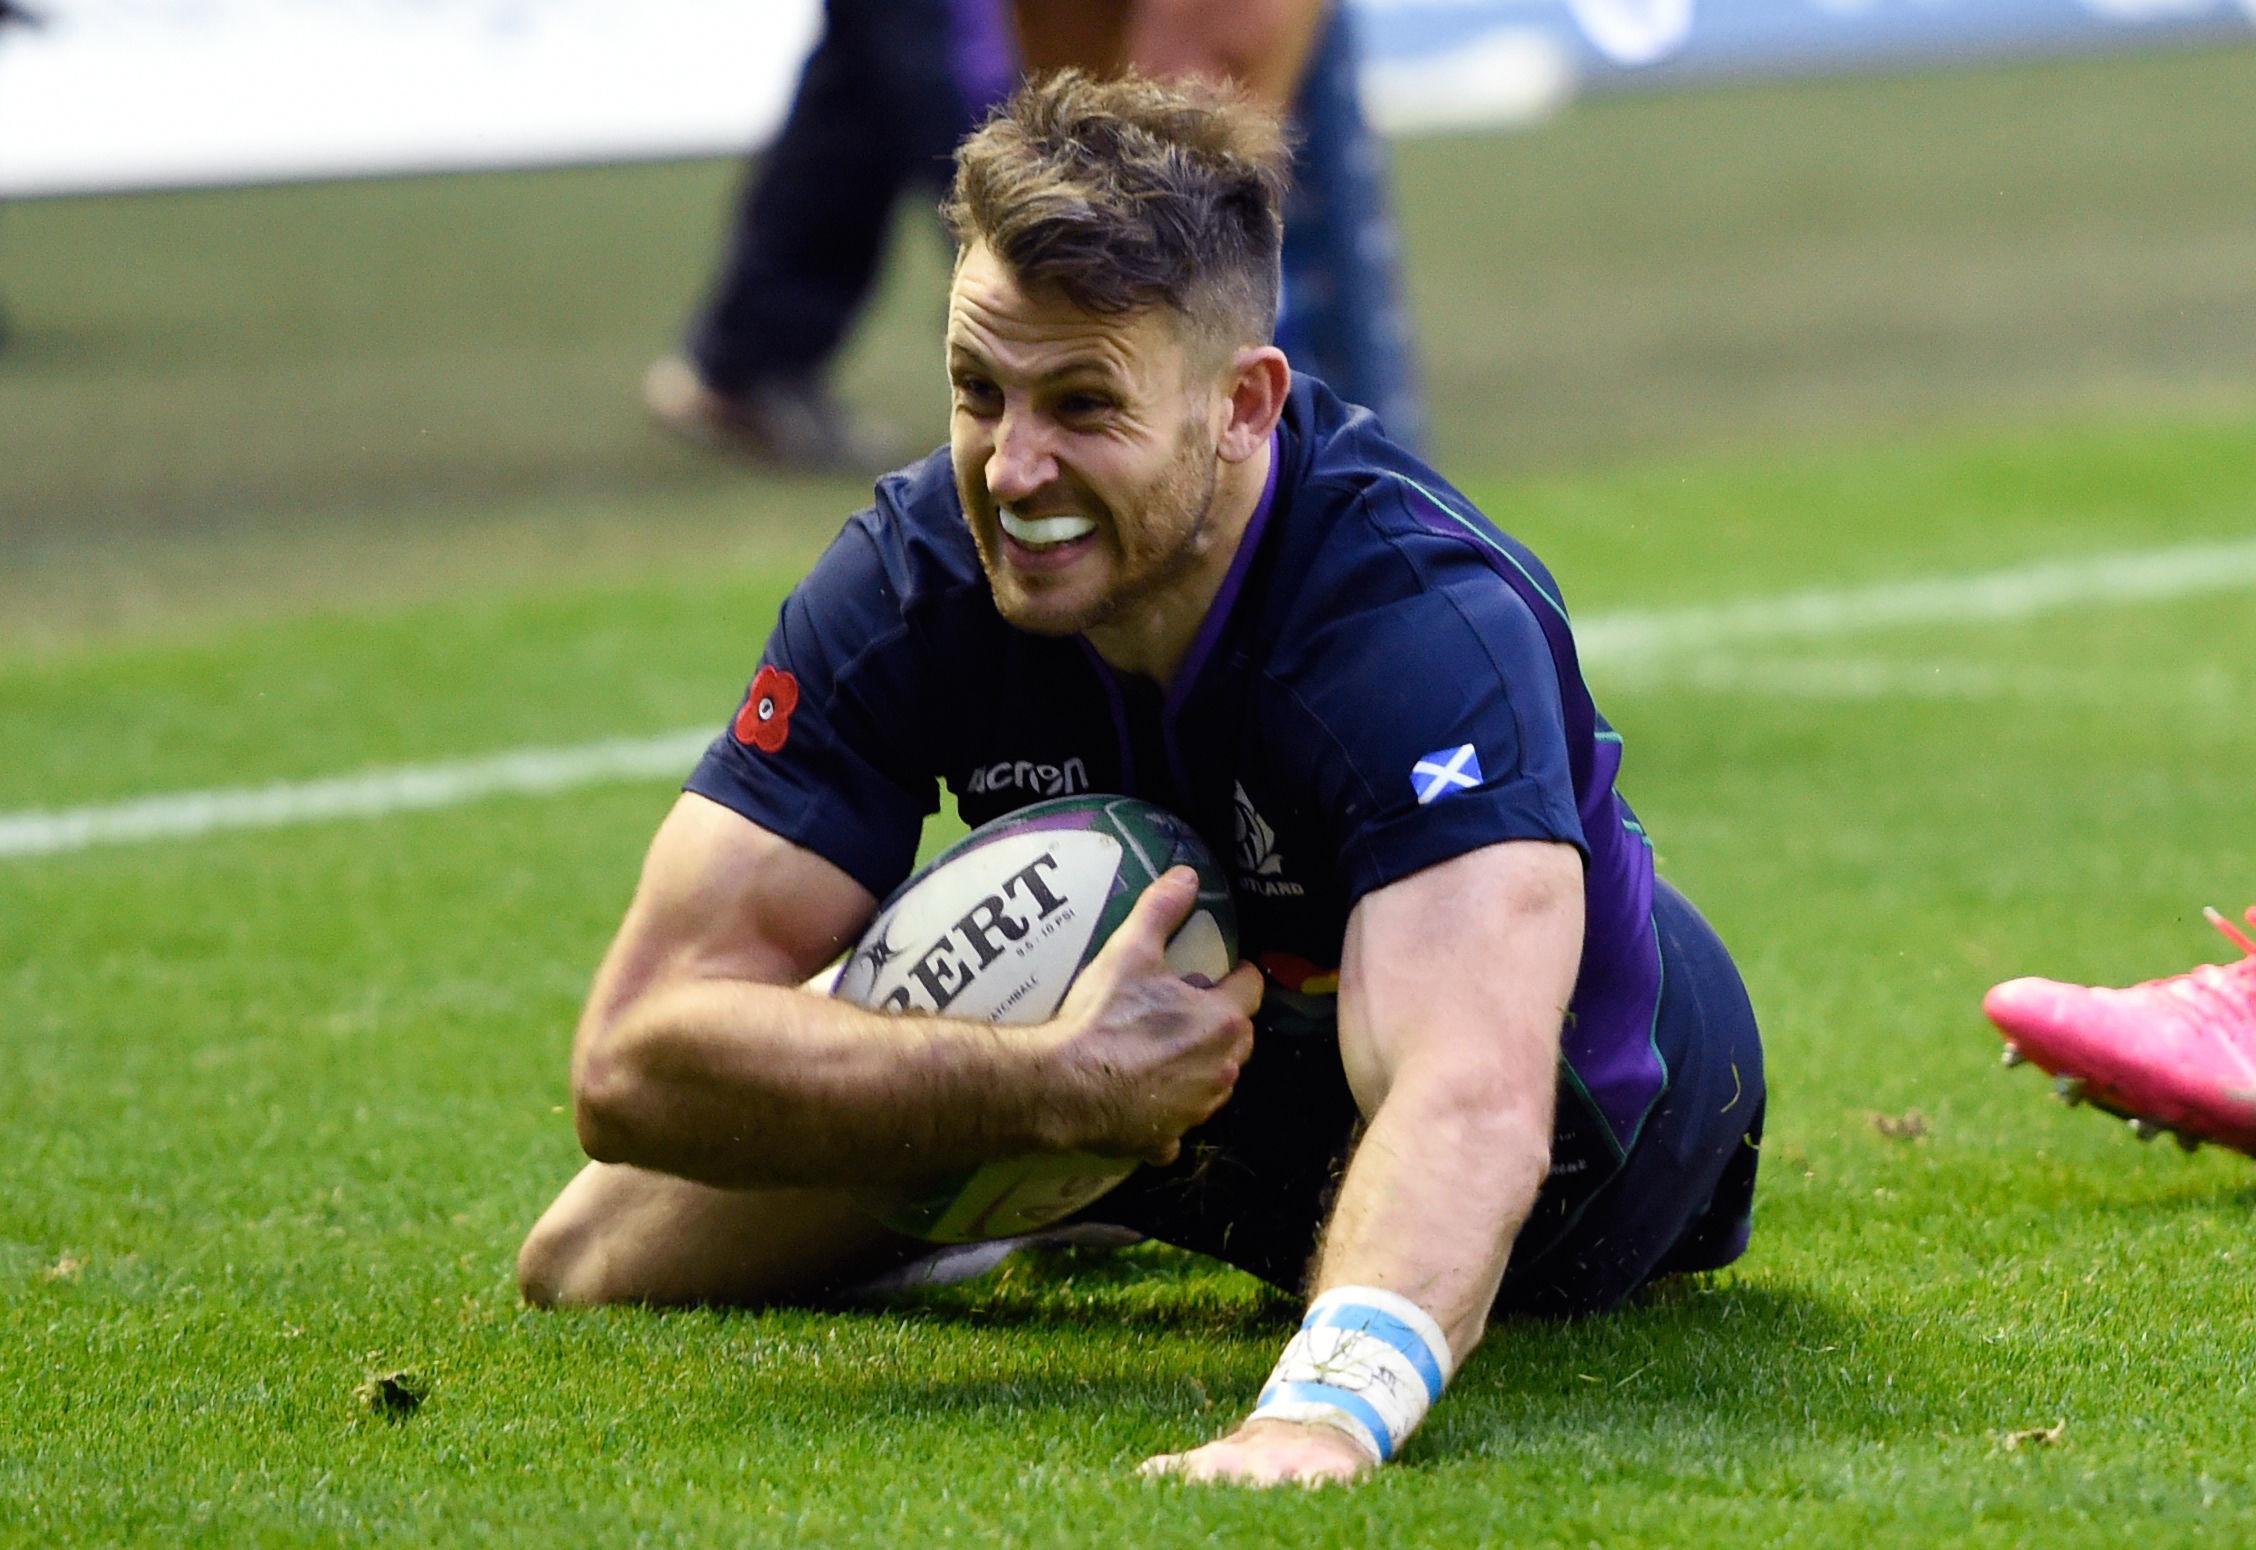 Scotland star Tommy Seymour scored a hat-trick of tries against Fiji